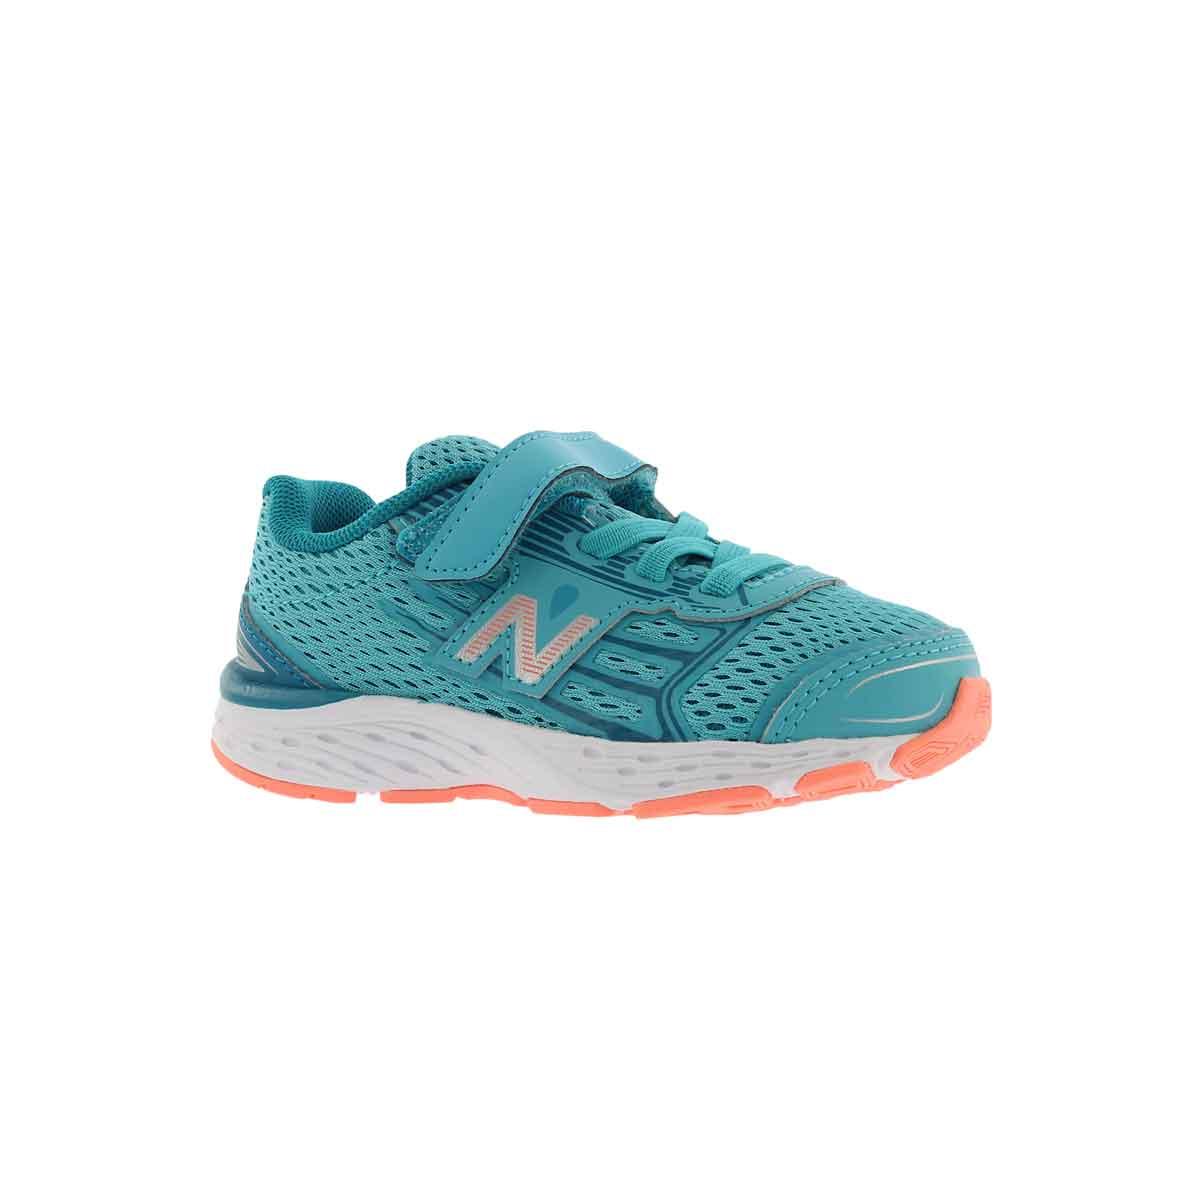 super popular a25bb 93070 Toddlers' 680v5 ozne blu/fiji sneakers- Wide